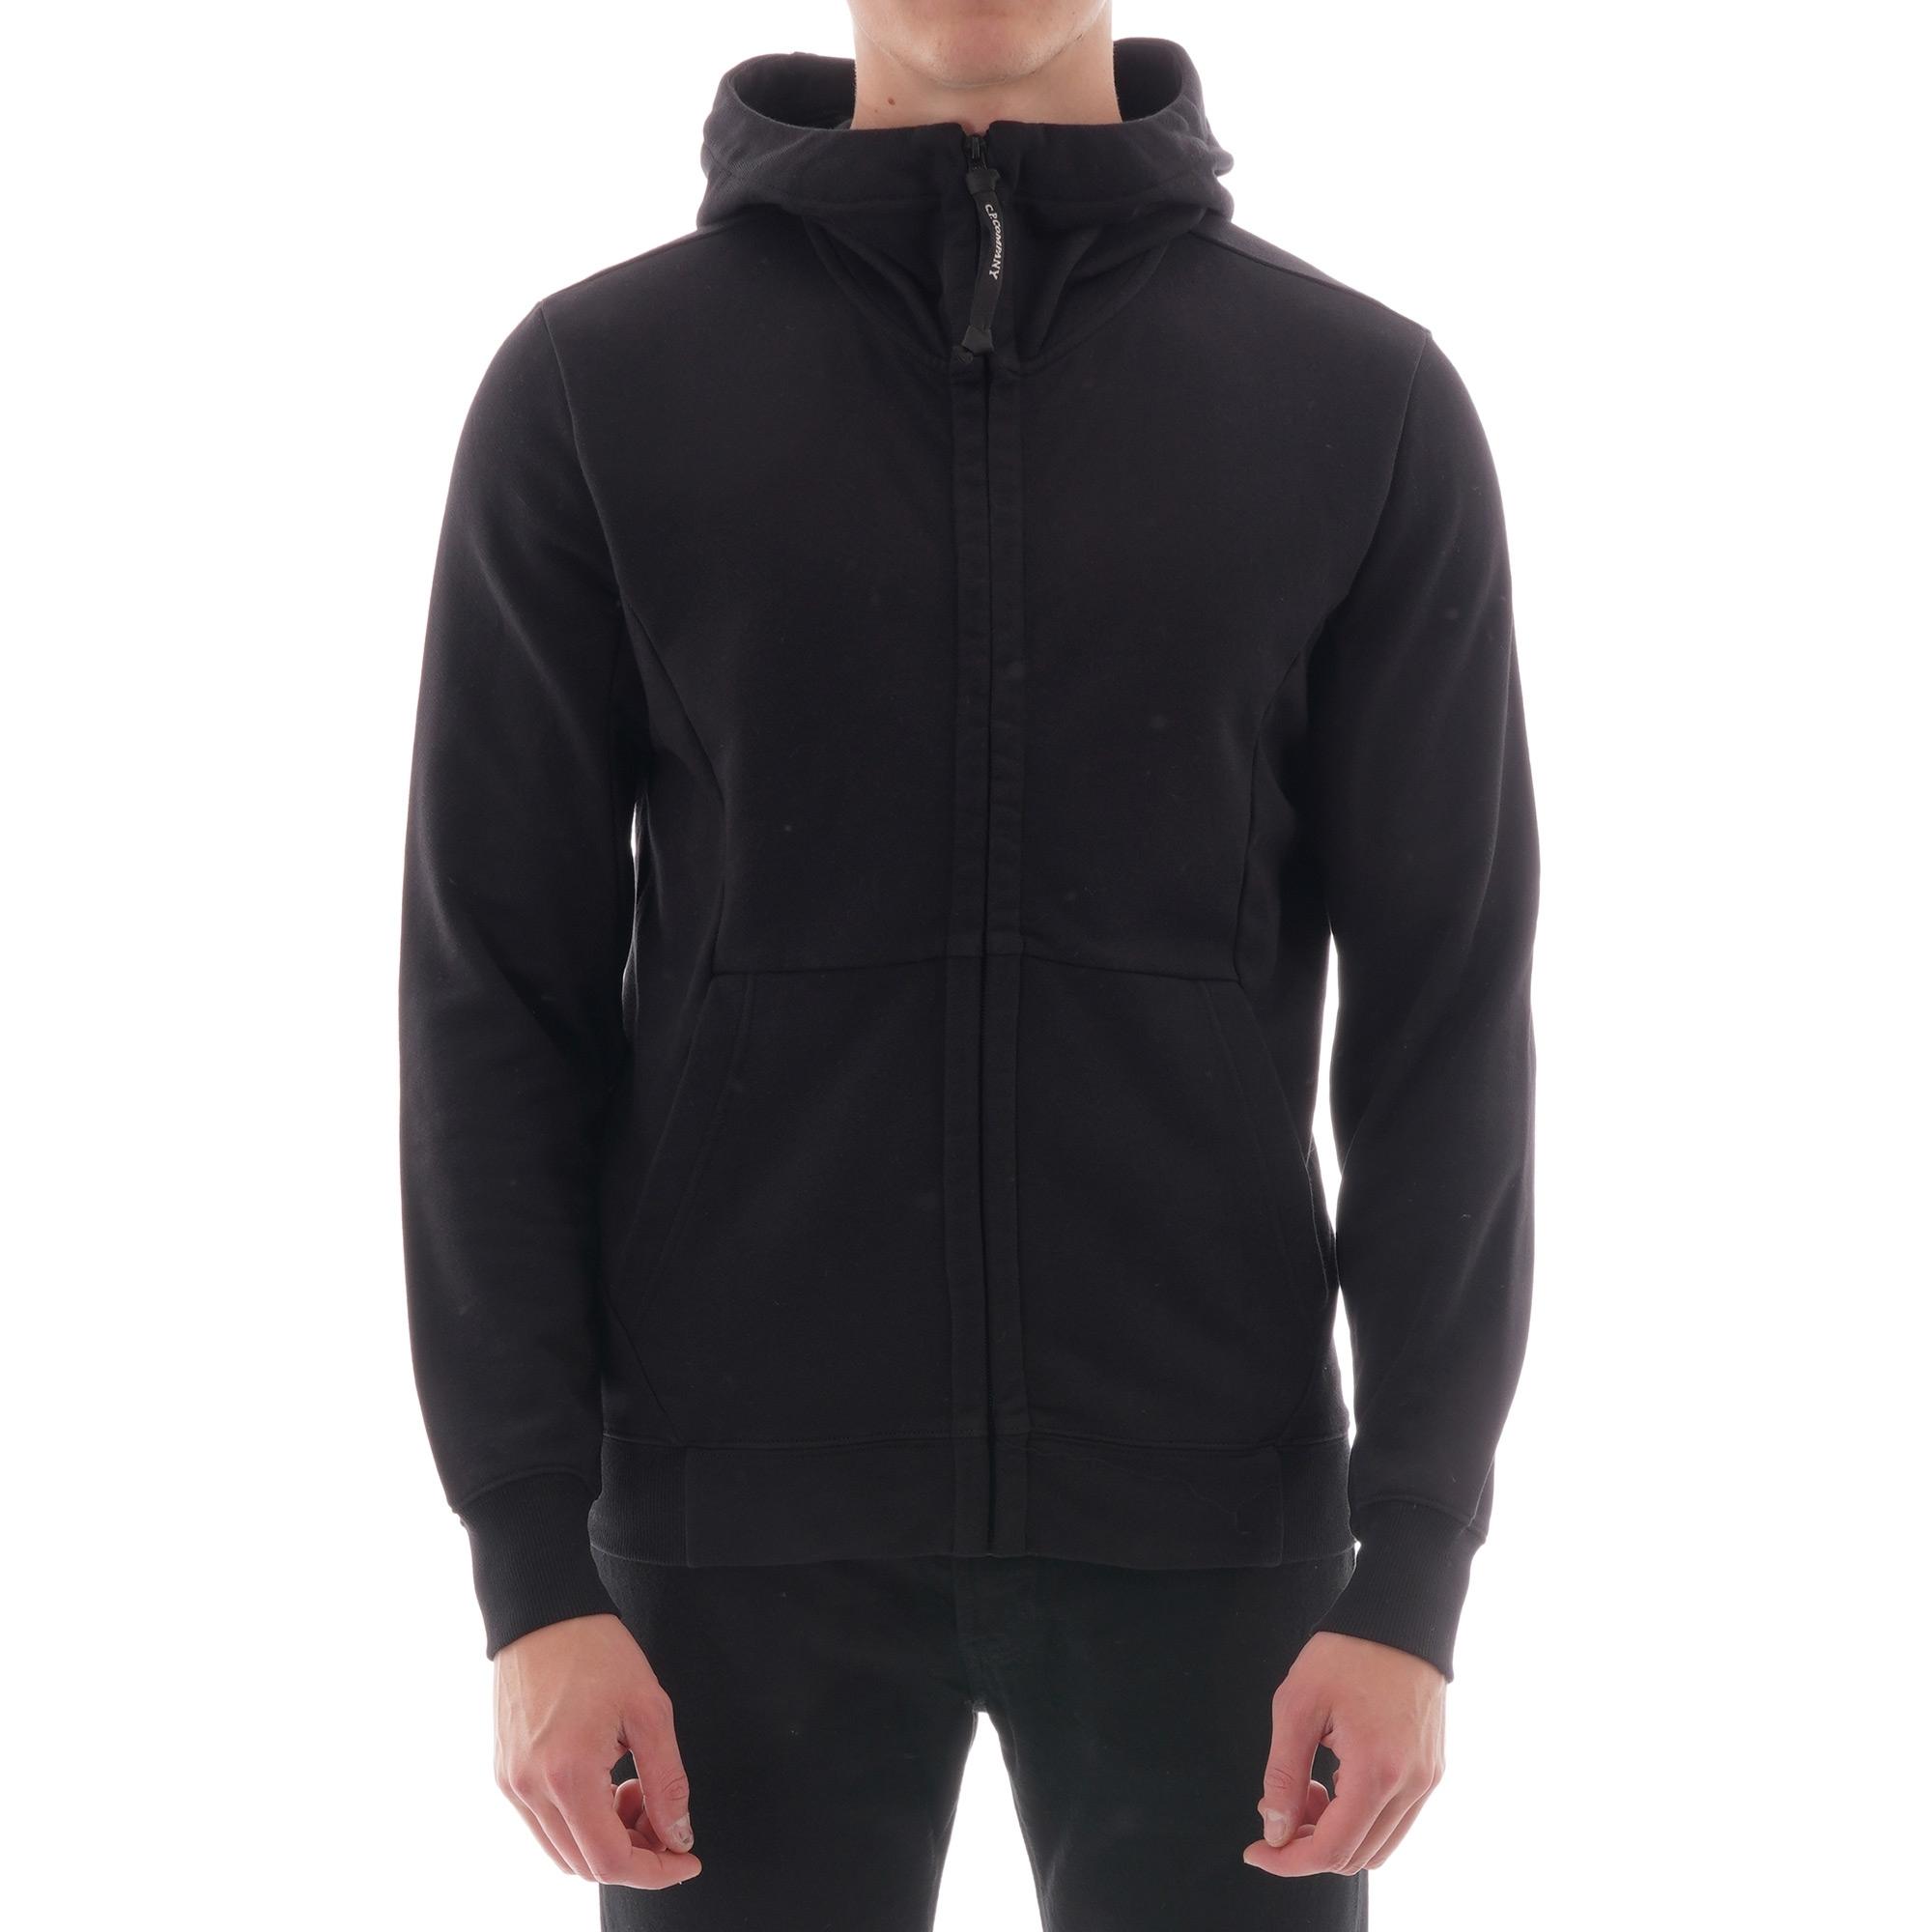 Image of Diagonal Raised Fleece Goggle Full Zip Hoodie - Black